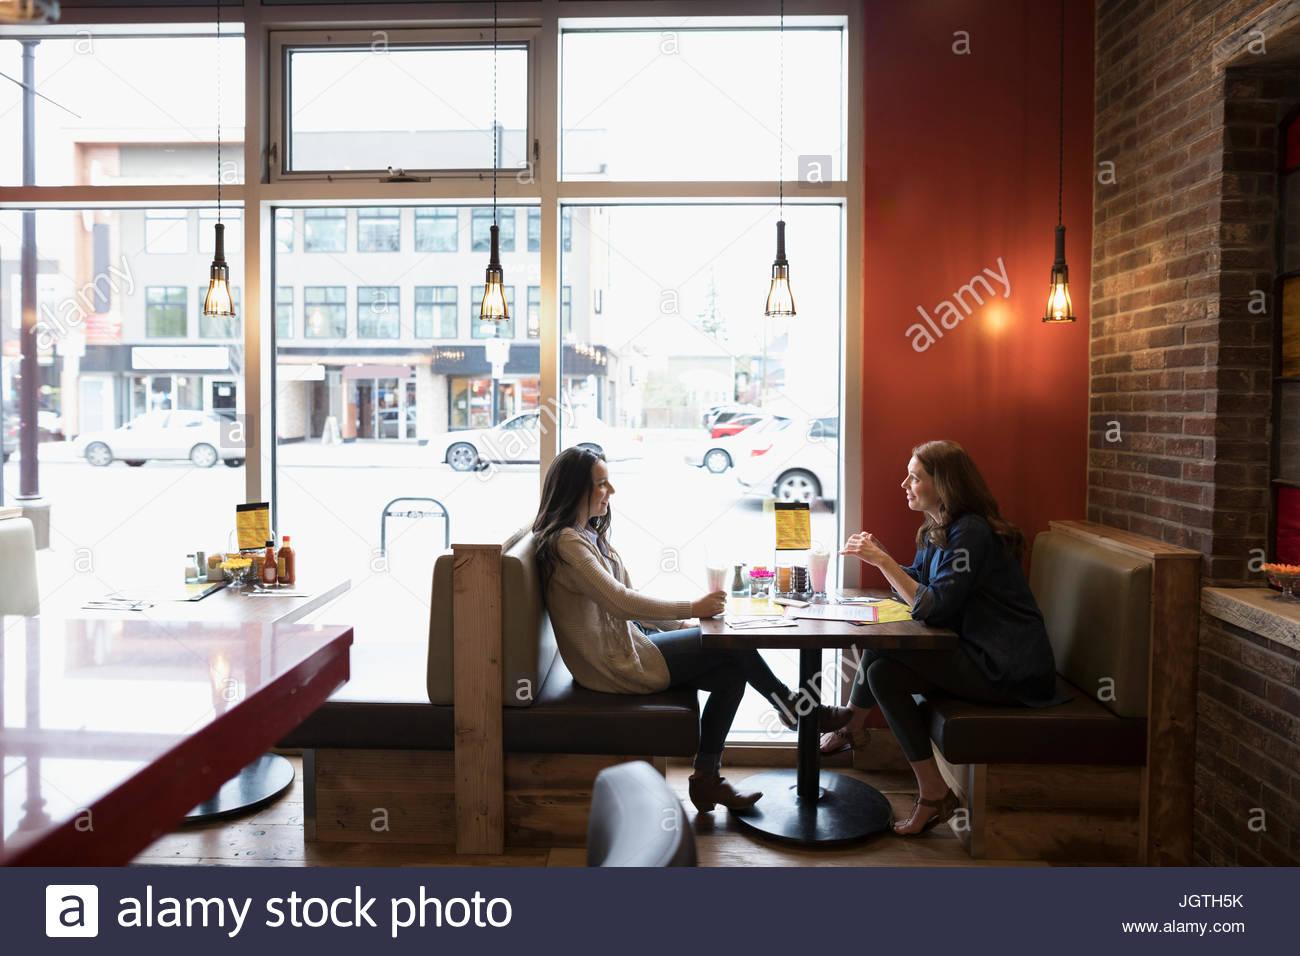 Mère et fille adolescente à parler, à manger diner booth Photo Stock